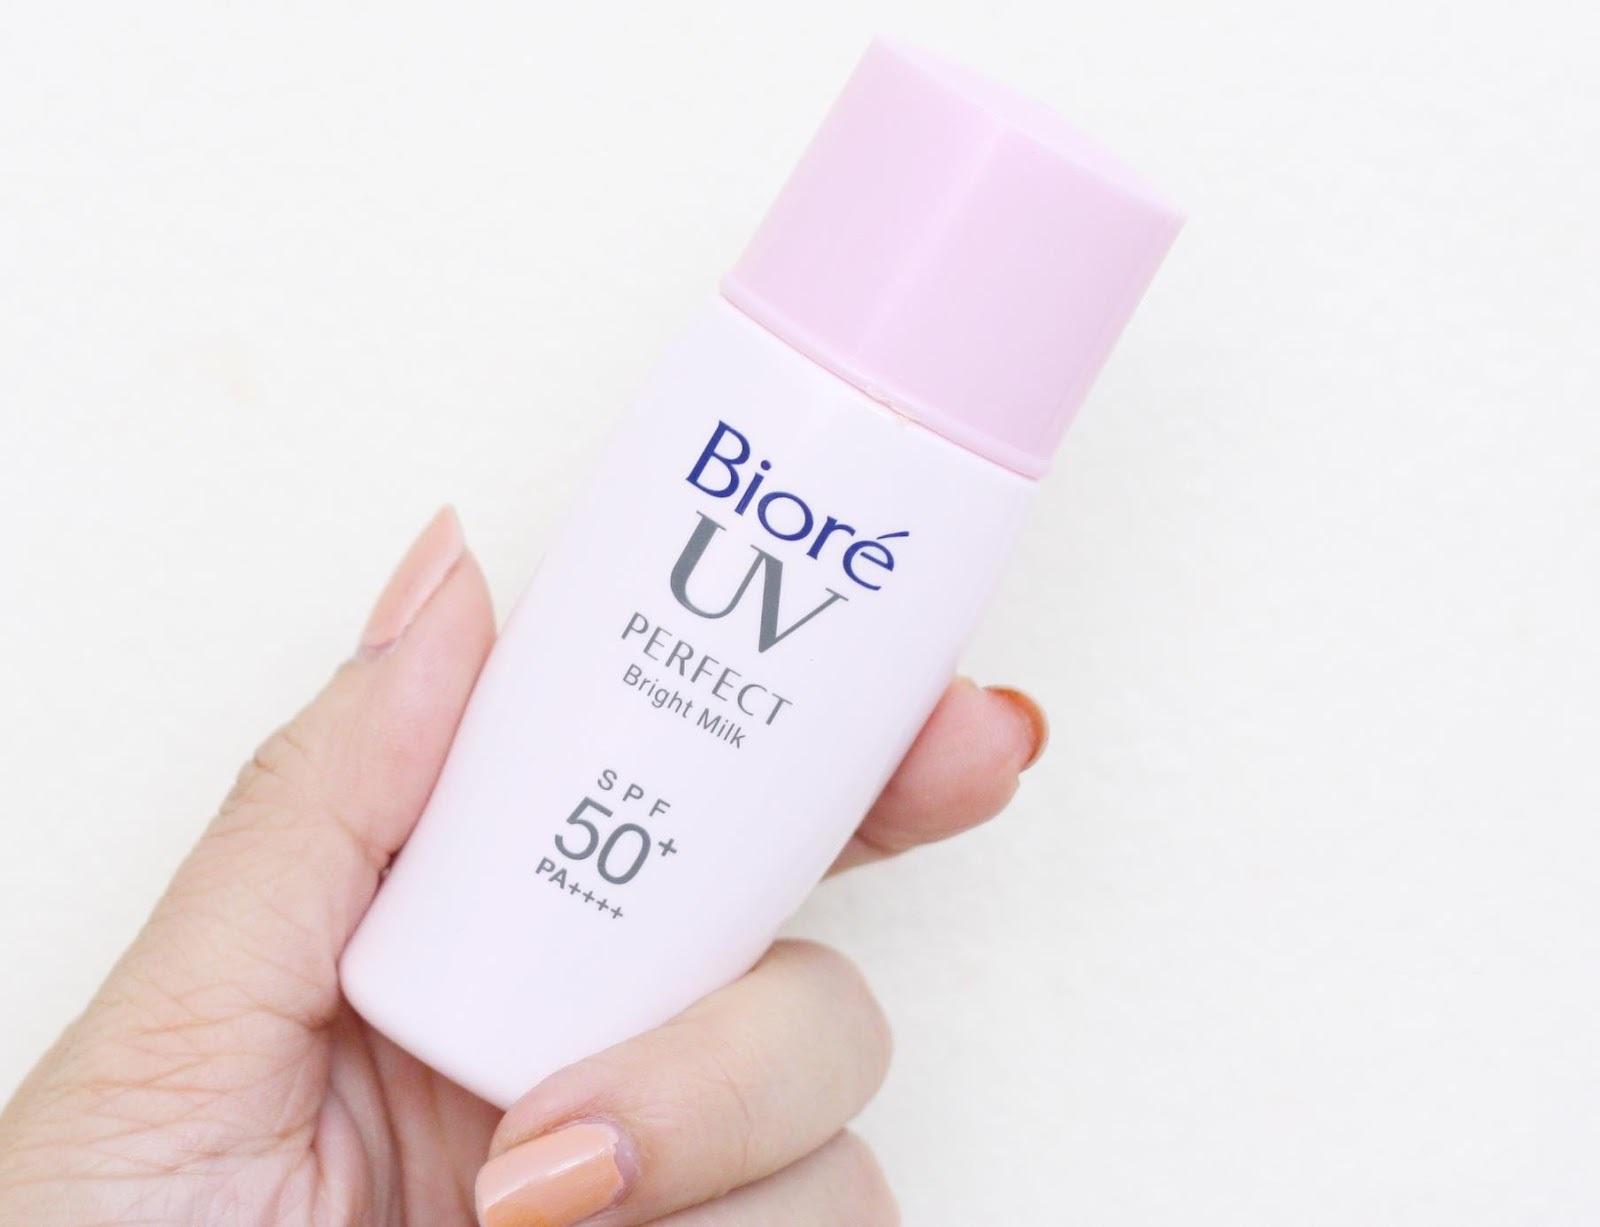 Kem chốnBiore UV Bright Face Milk